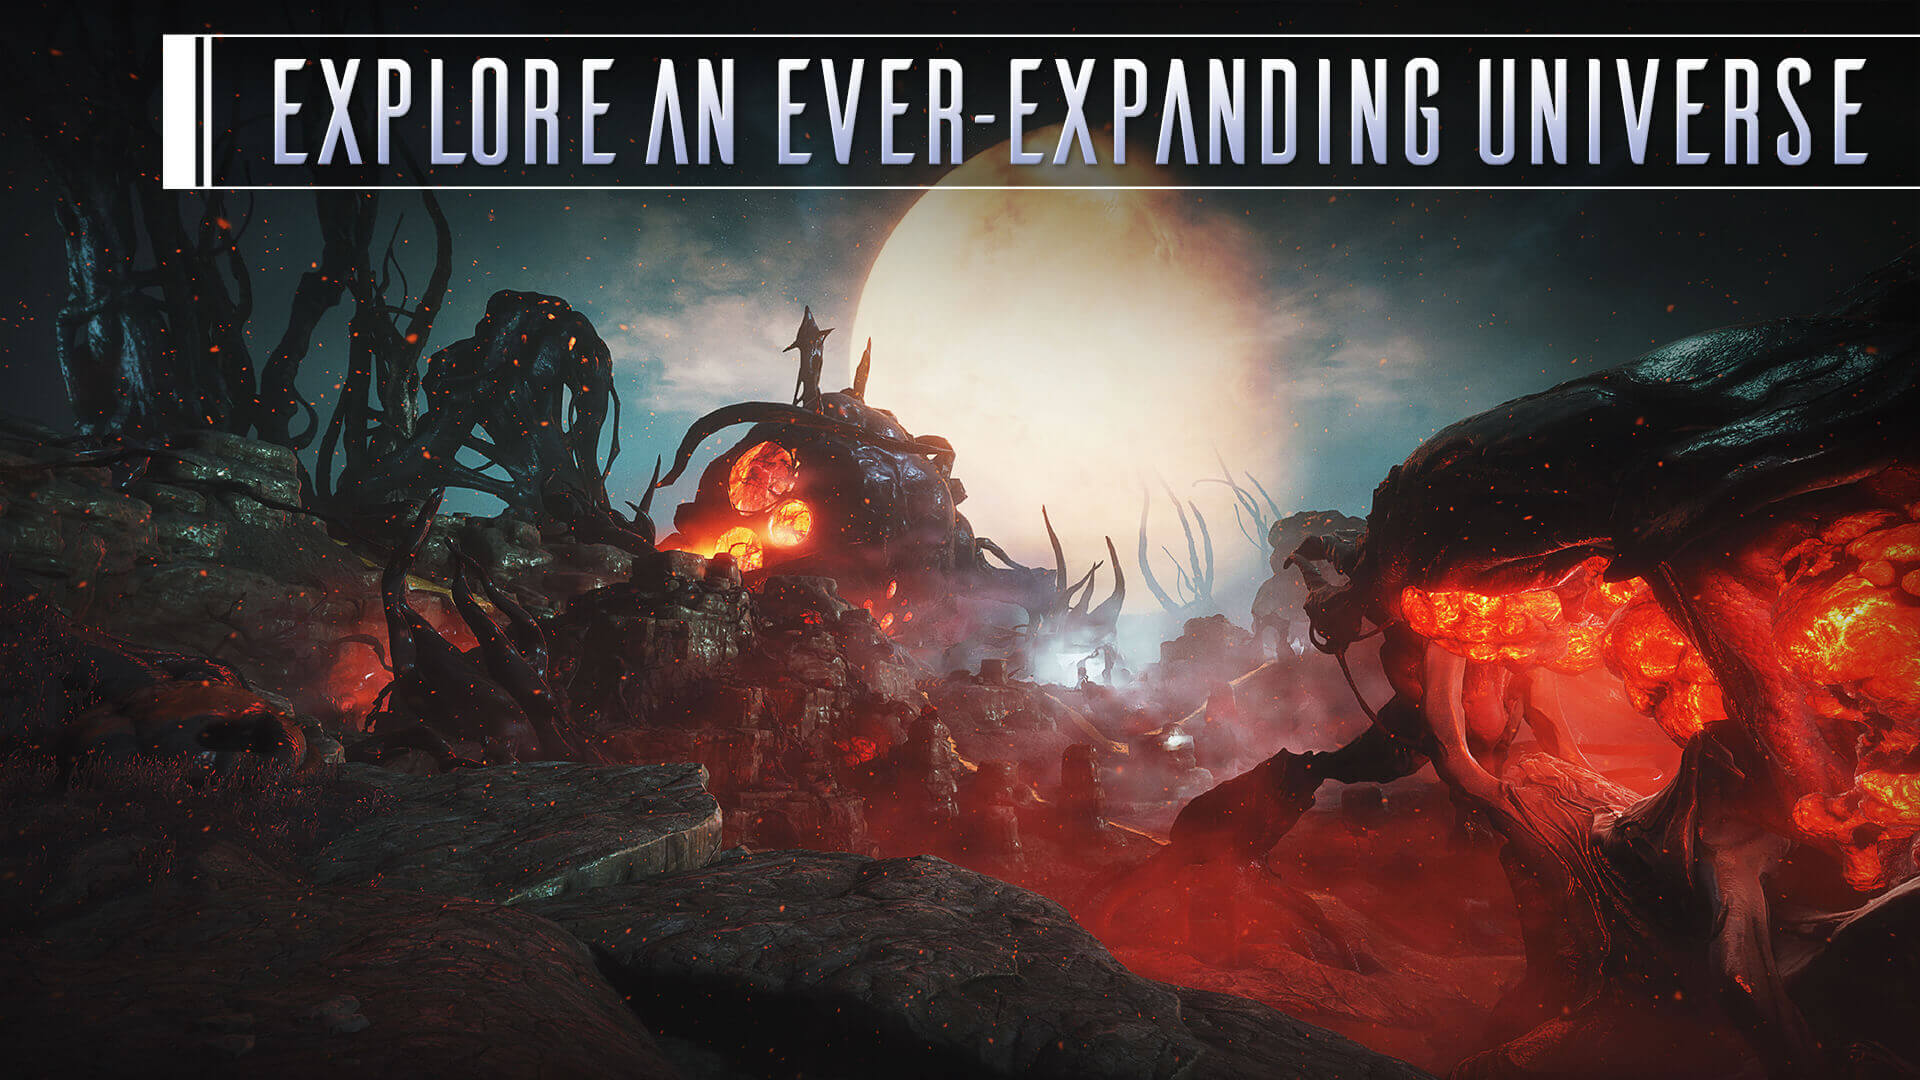 Explore an Ever-expanding Universe